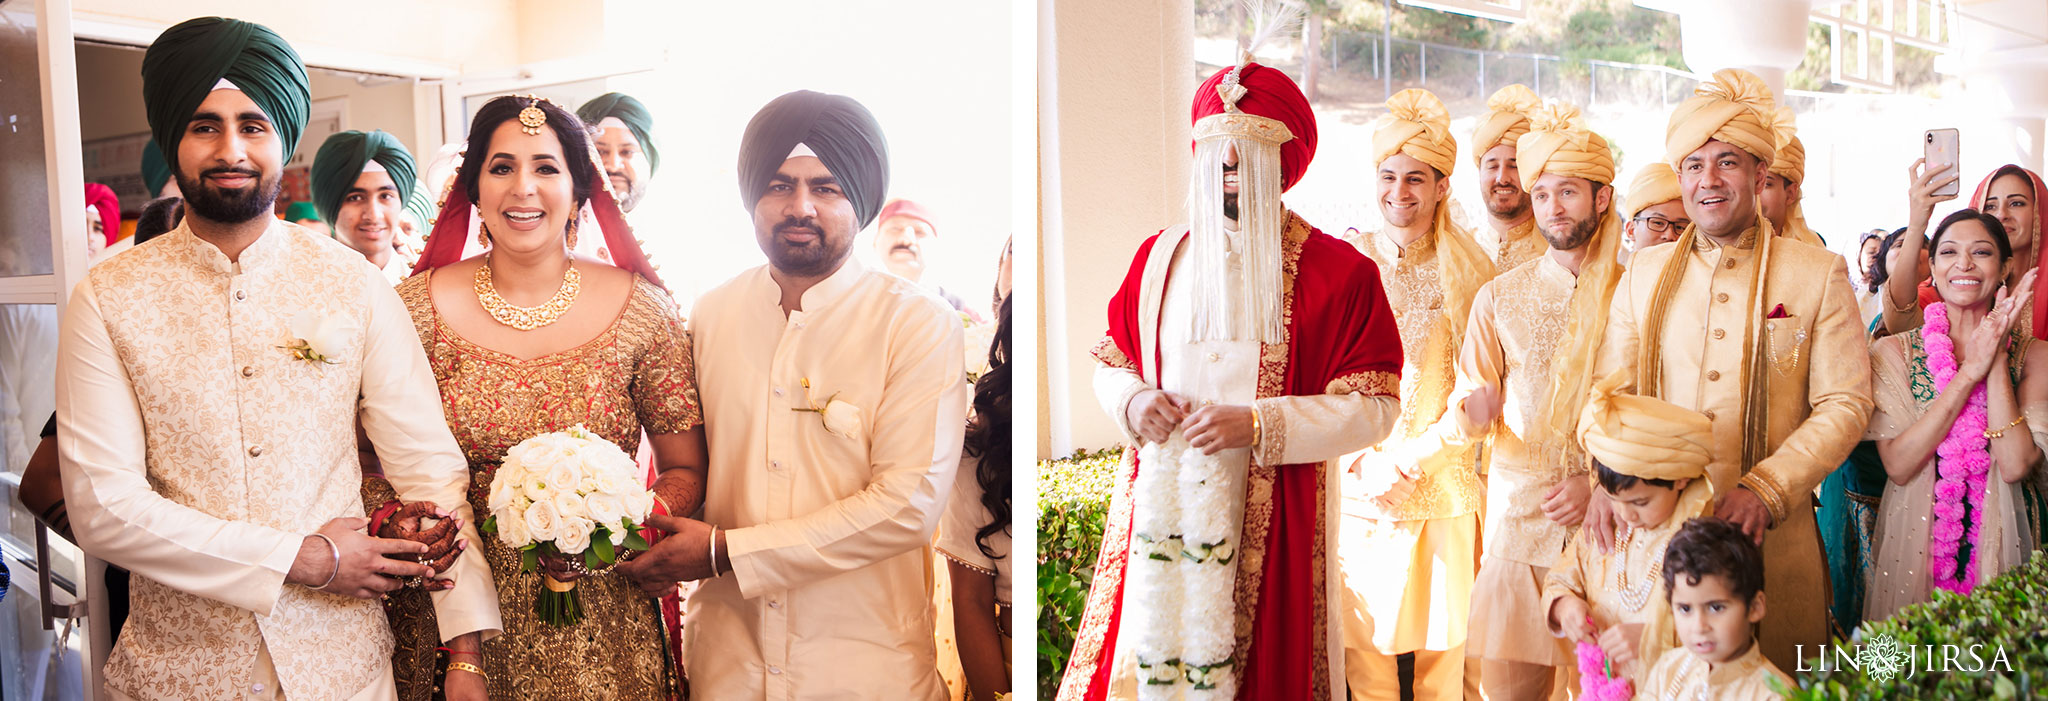 023 san francisco sikh center punjabi wedding photography